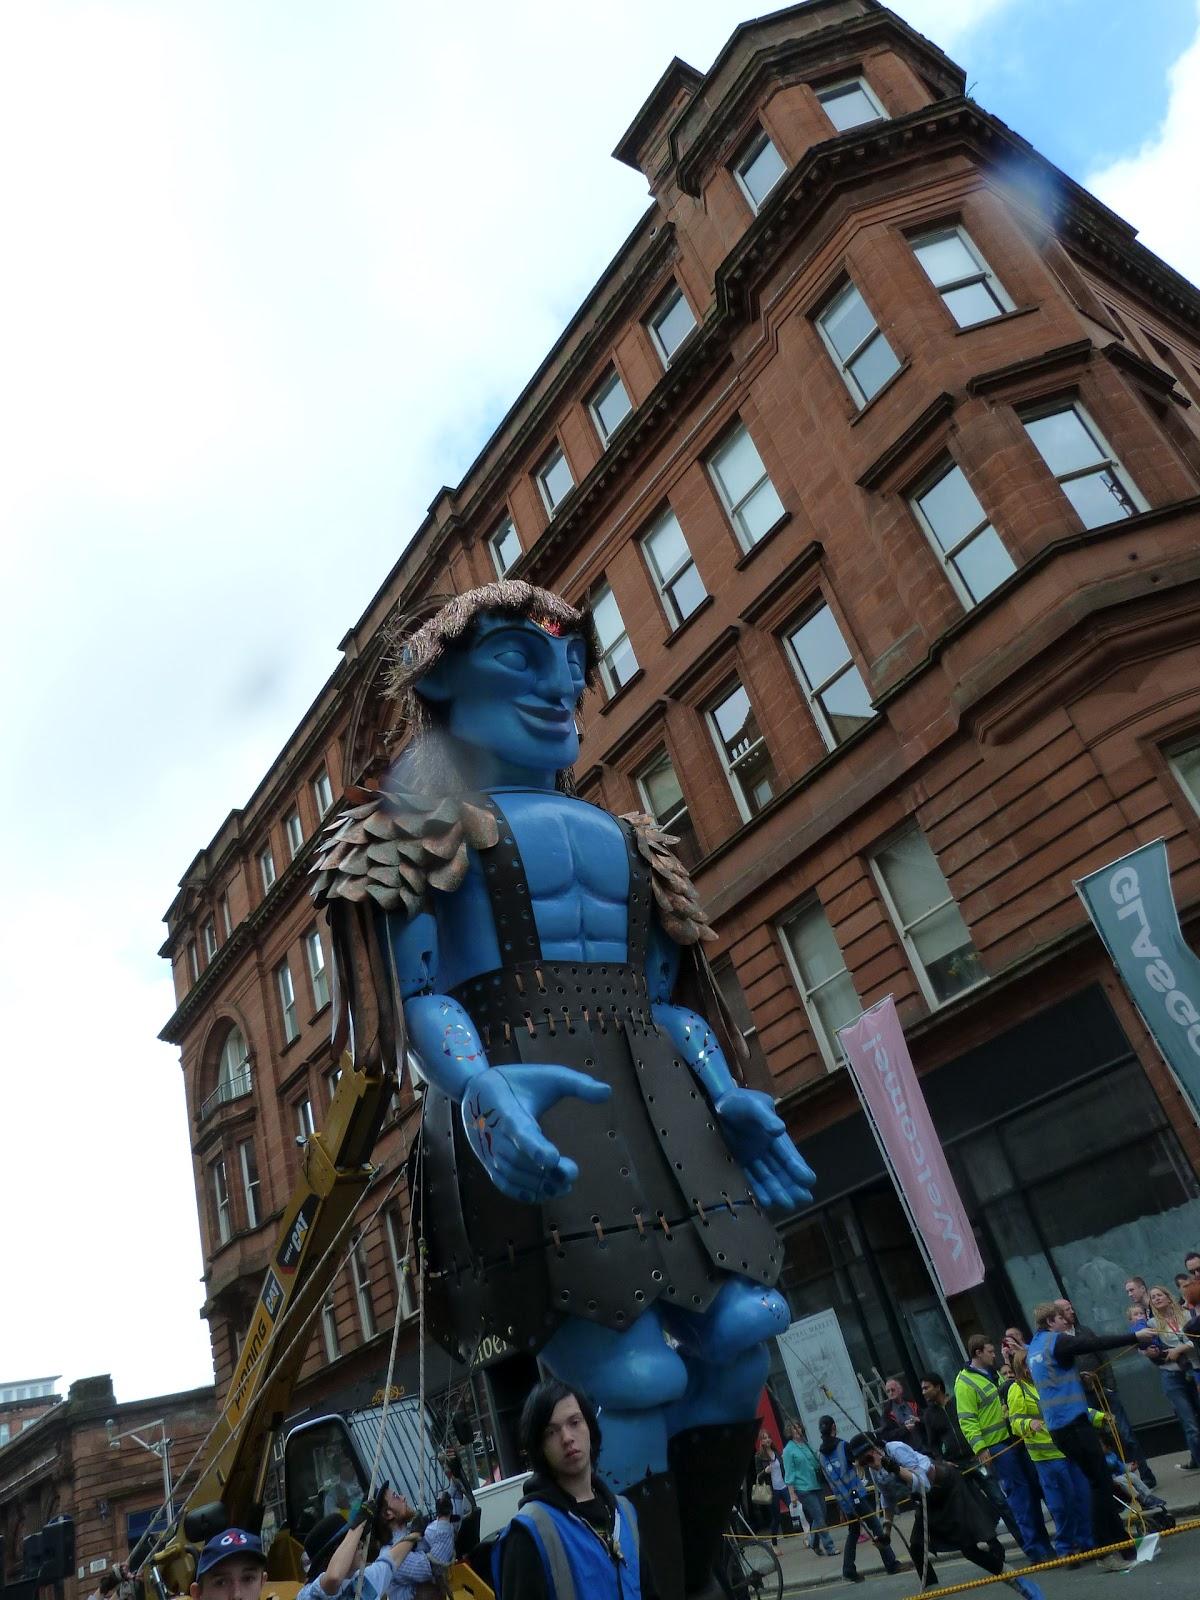 The Big Man at Glasgow's Merchant City Festival